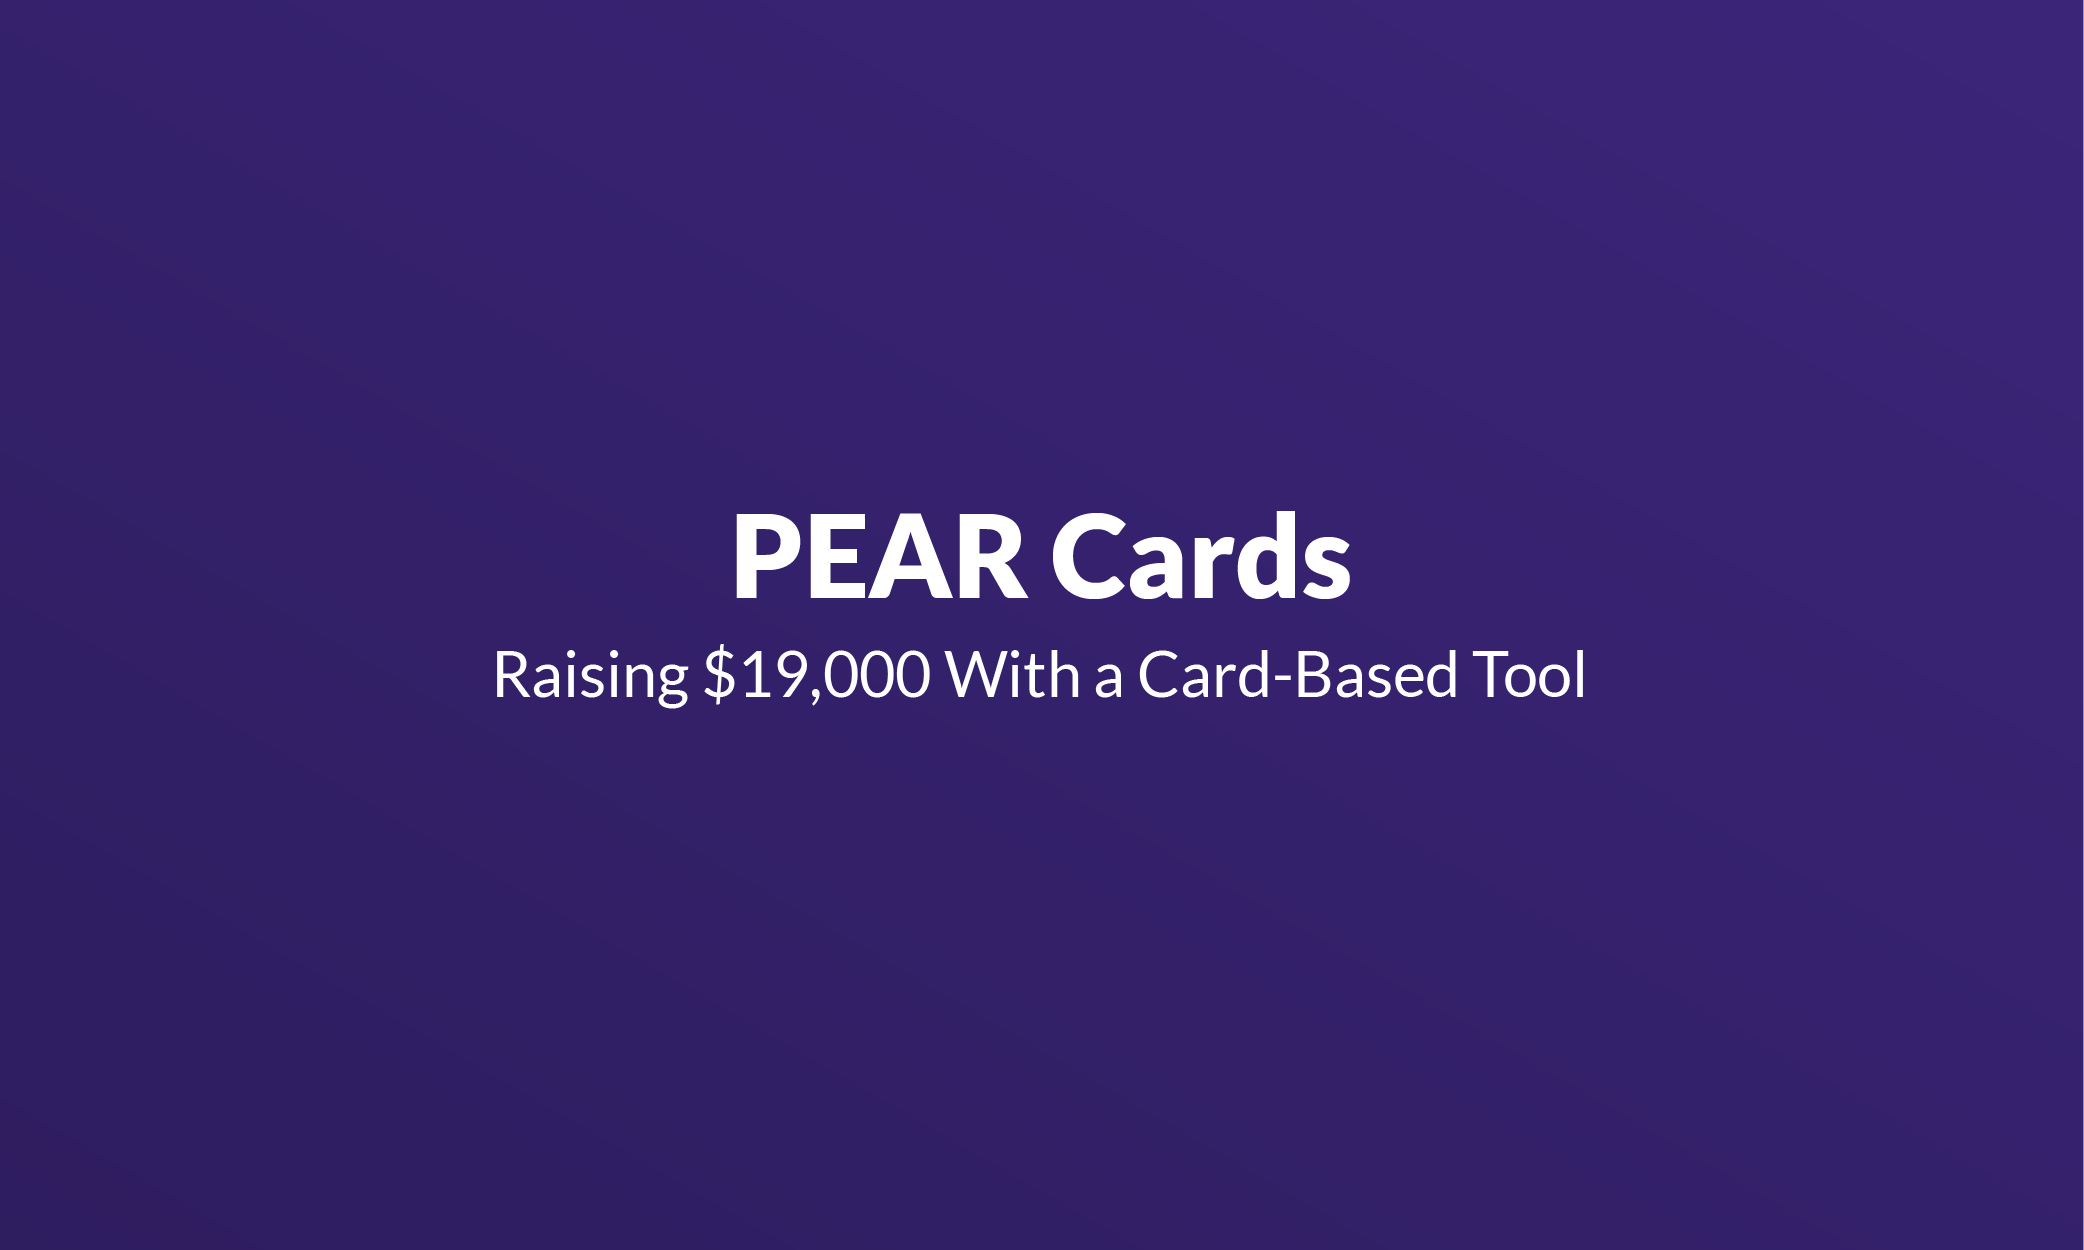 PEAR Cards Mistakes